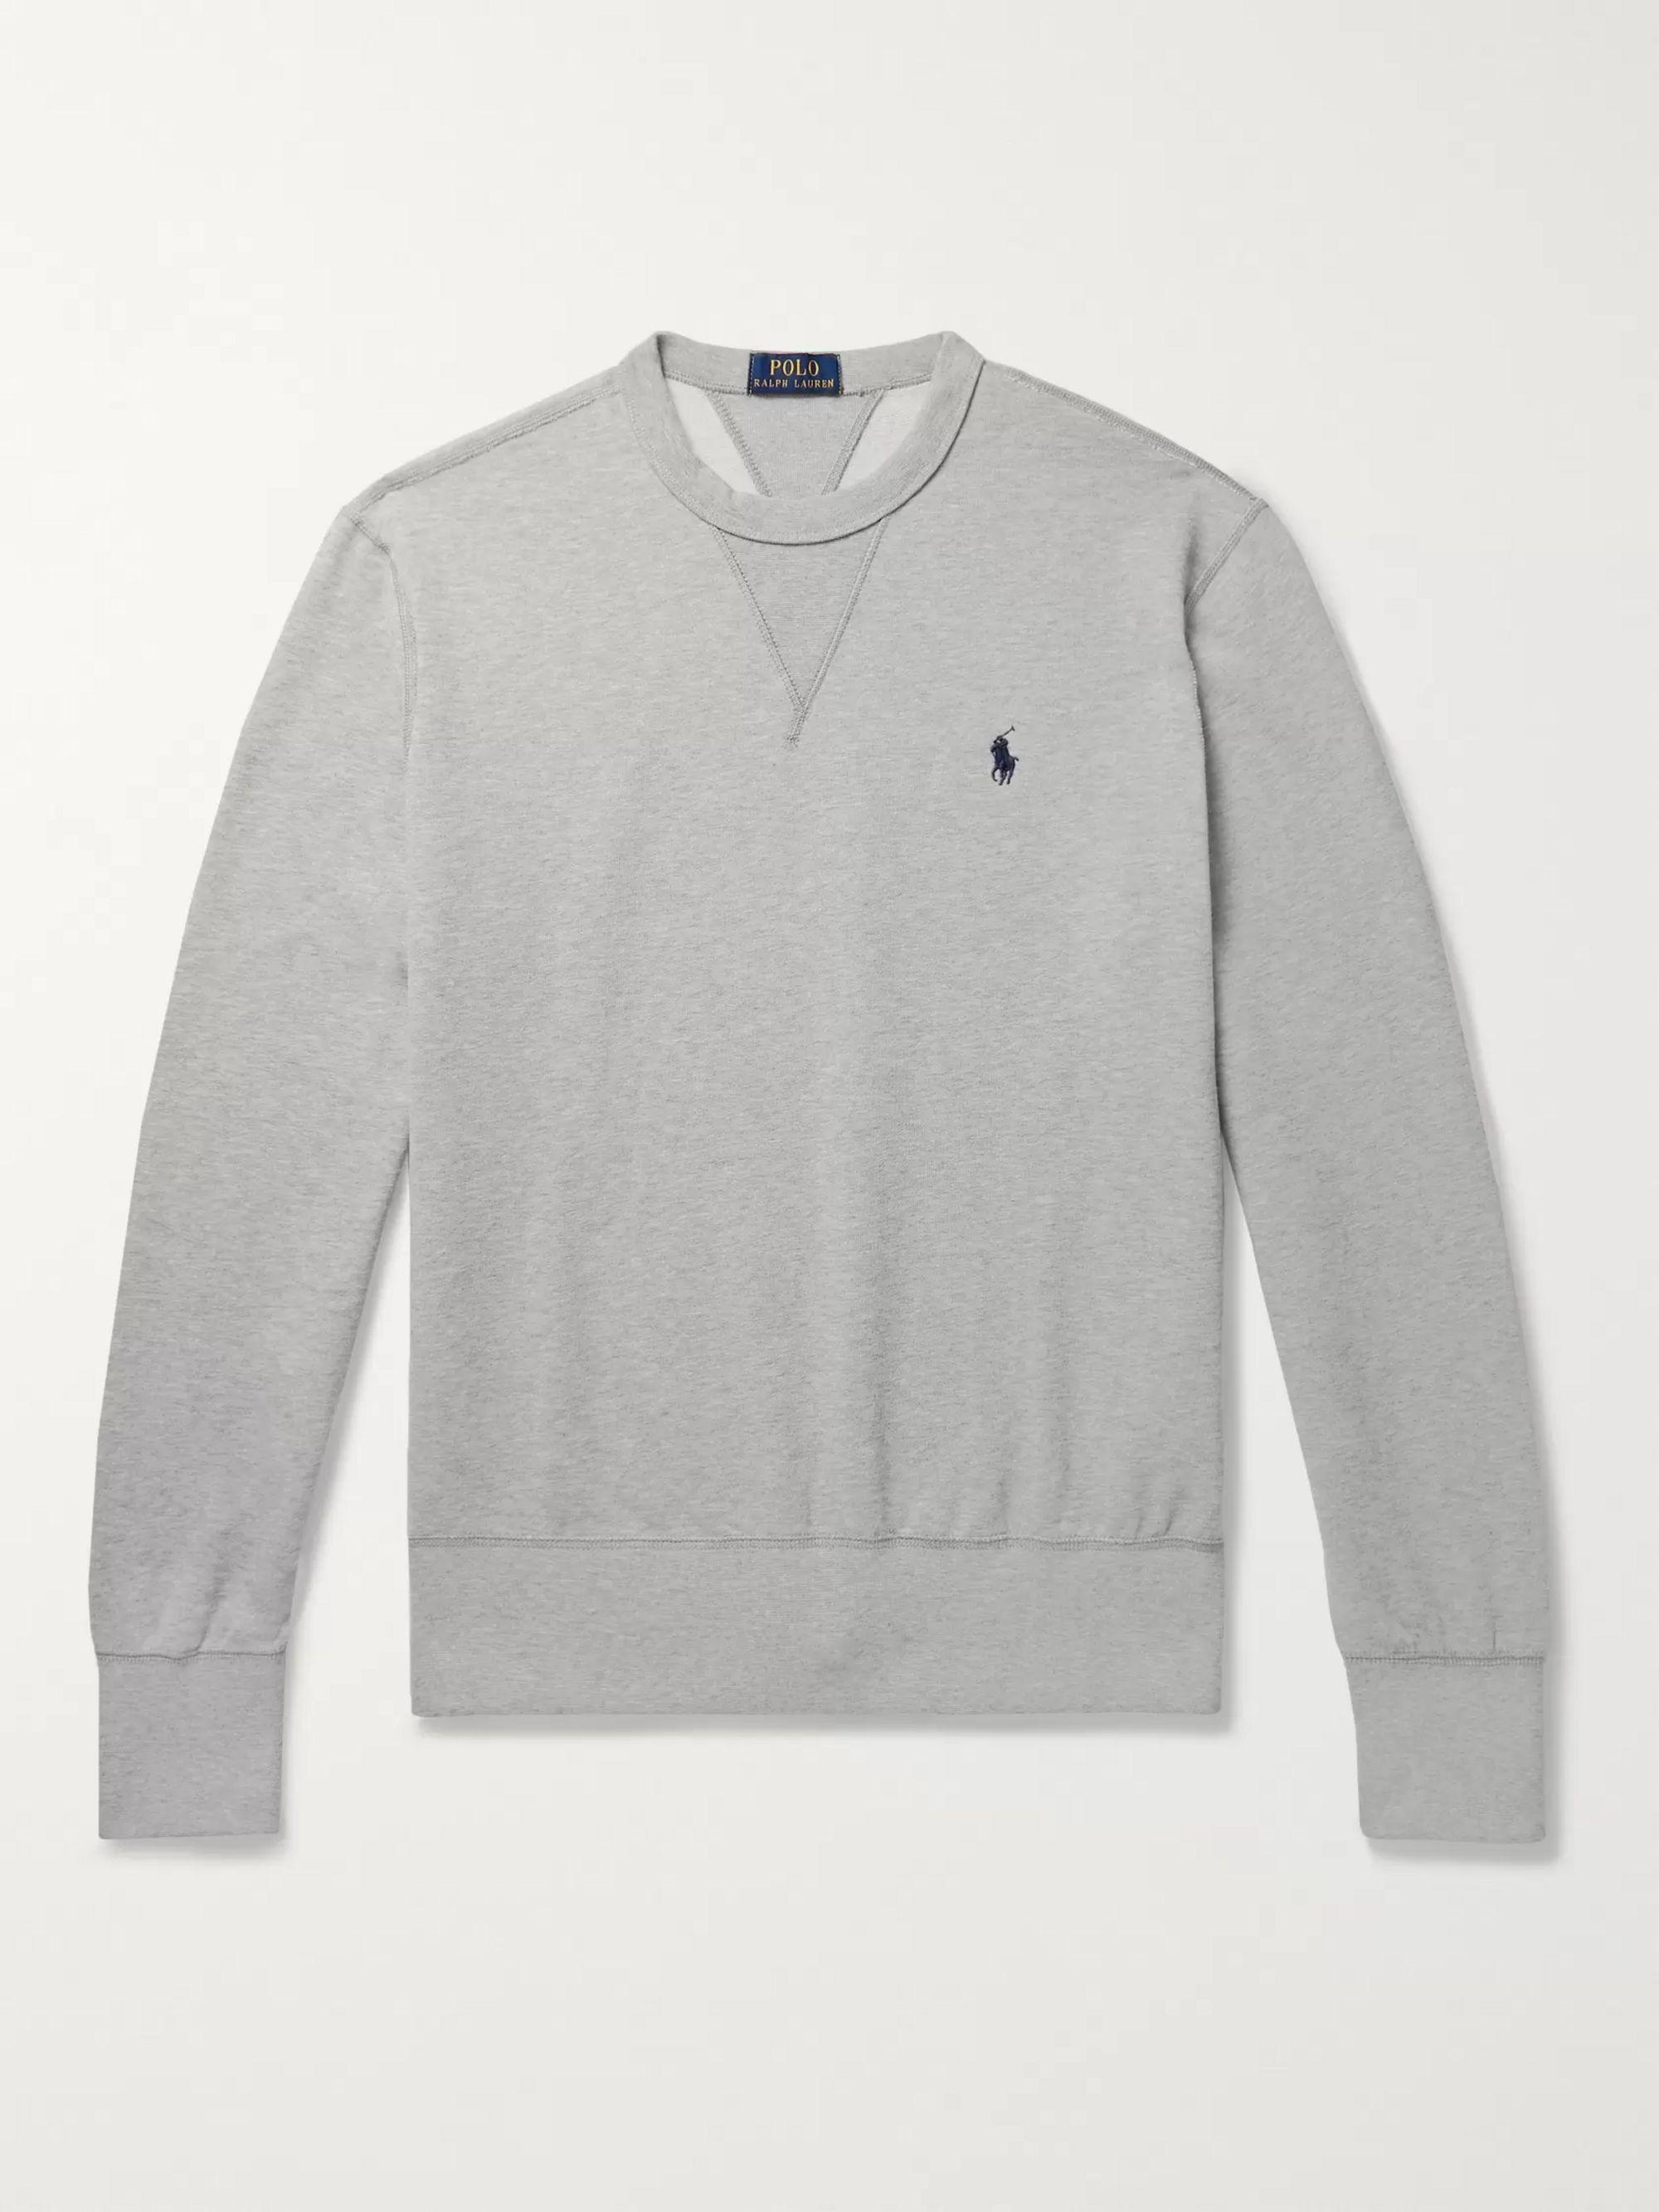 Mélange Fleece Back Cotton Blend Jersey Sweatshirt